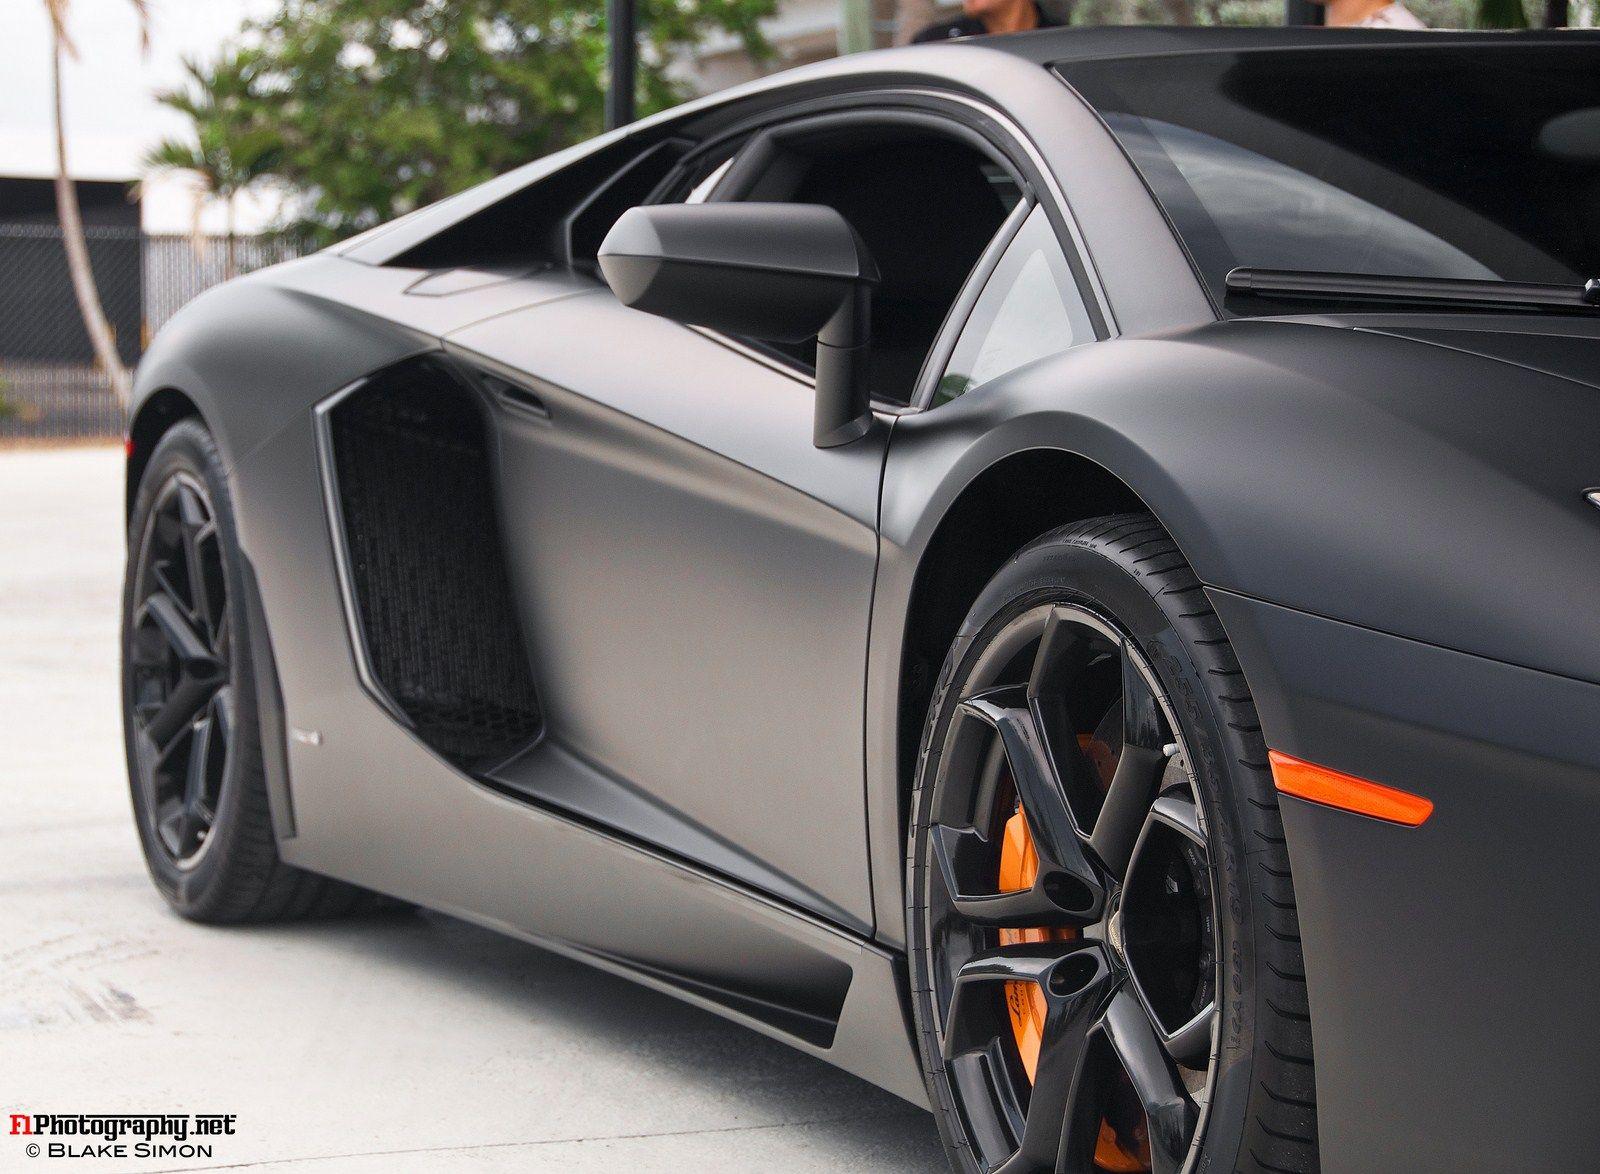 Matte Black Lamborghini Aventador (I matte black paint ... on silver audi black, silver jeep wrangler black, silver toyota sienna black, silver range rover evoque black,